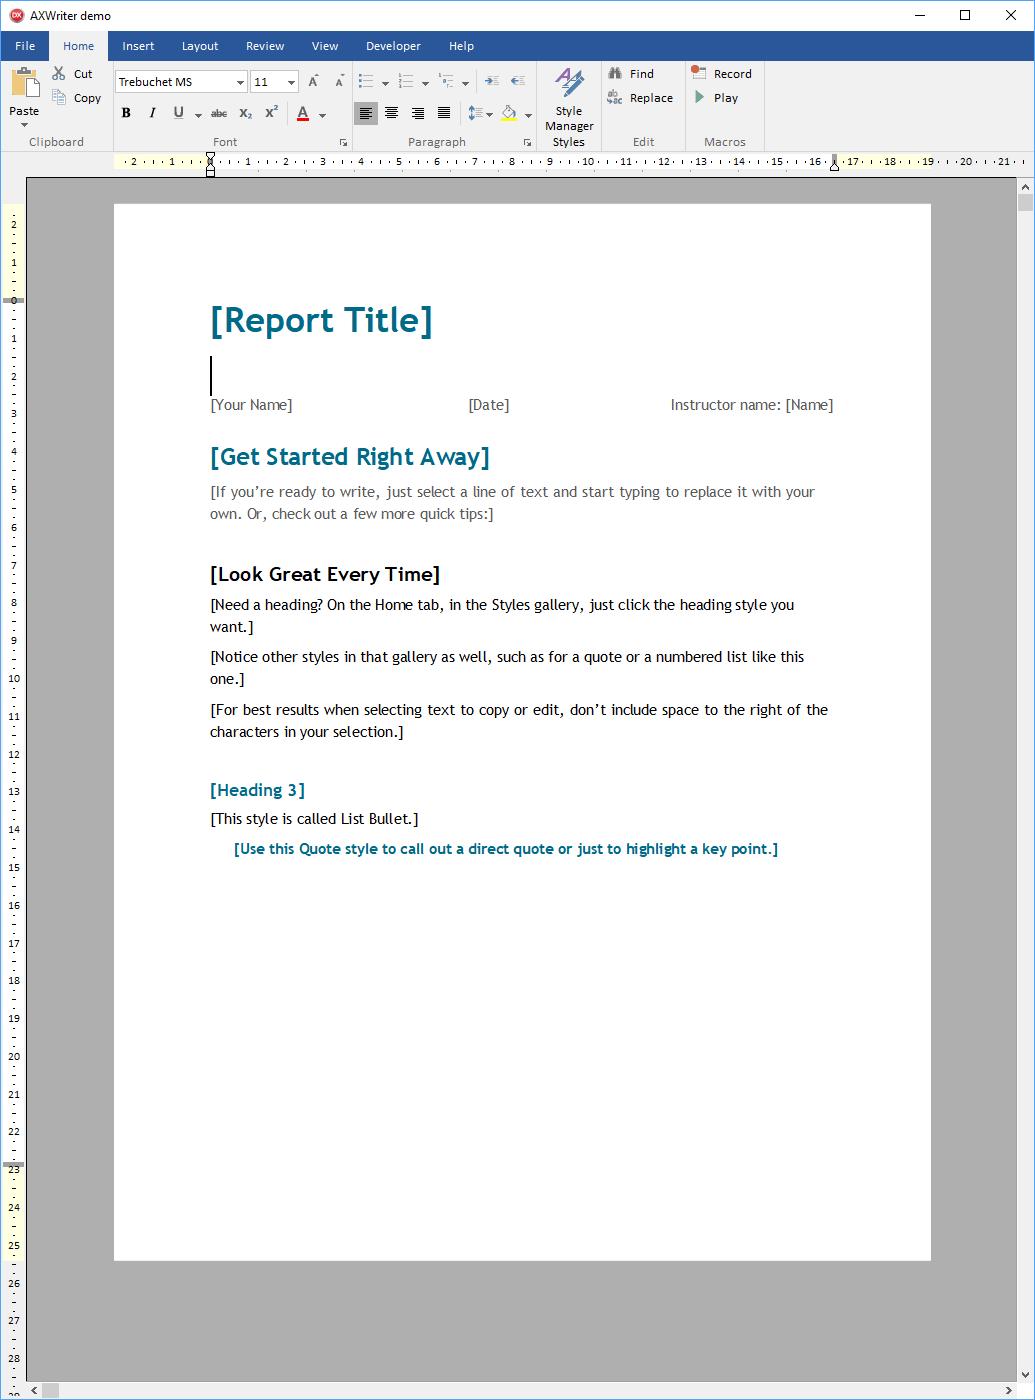 AXWWriter预览:查看和编辑应用程序中的MS Word文件。